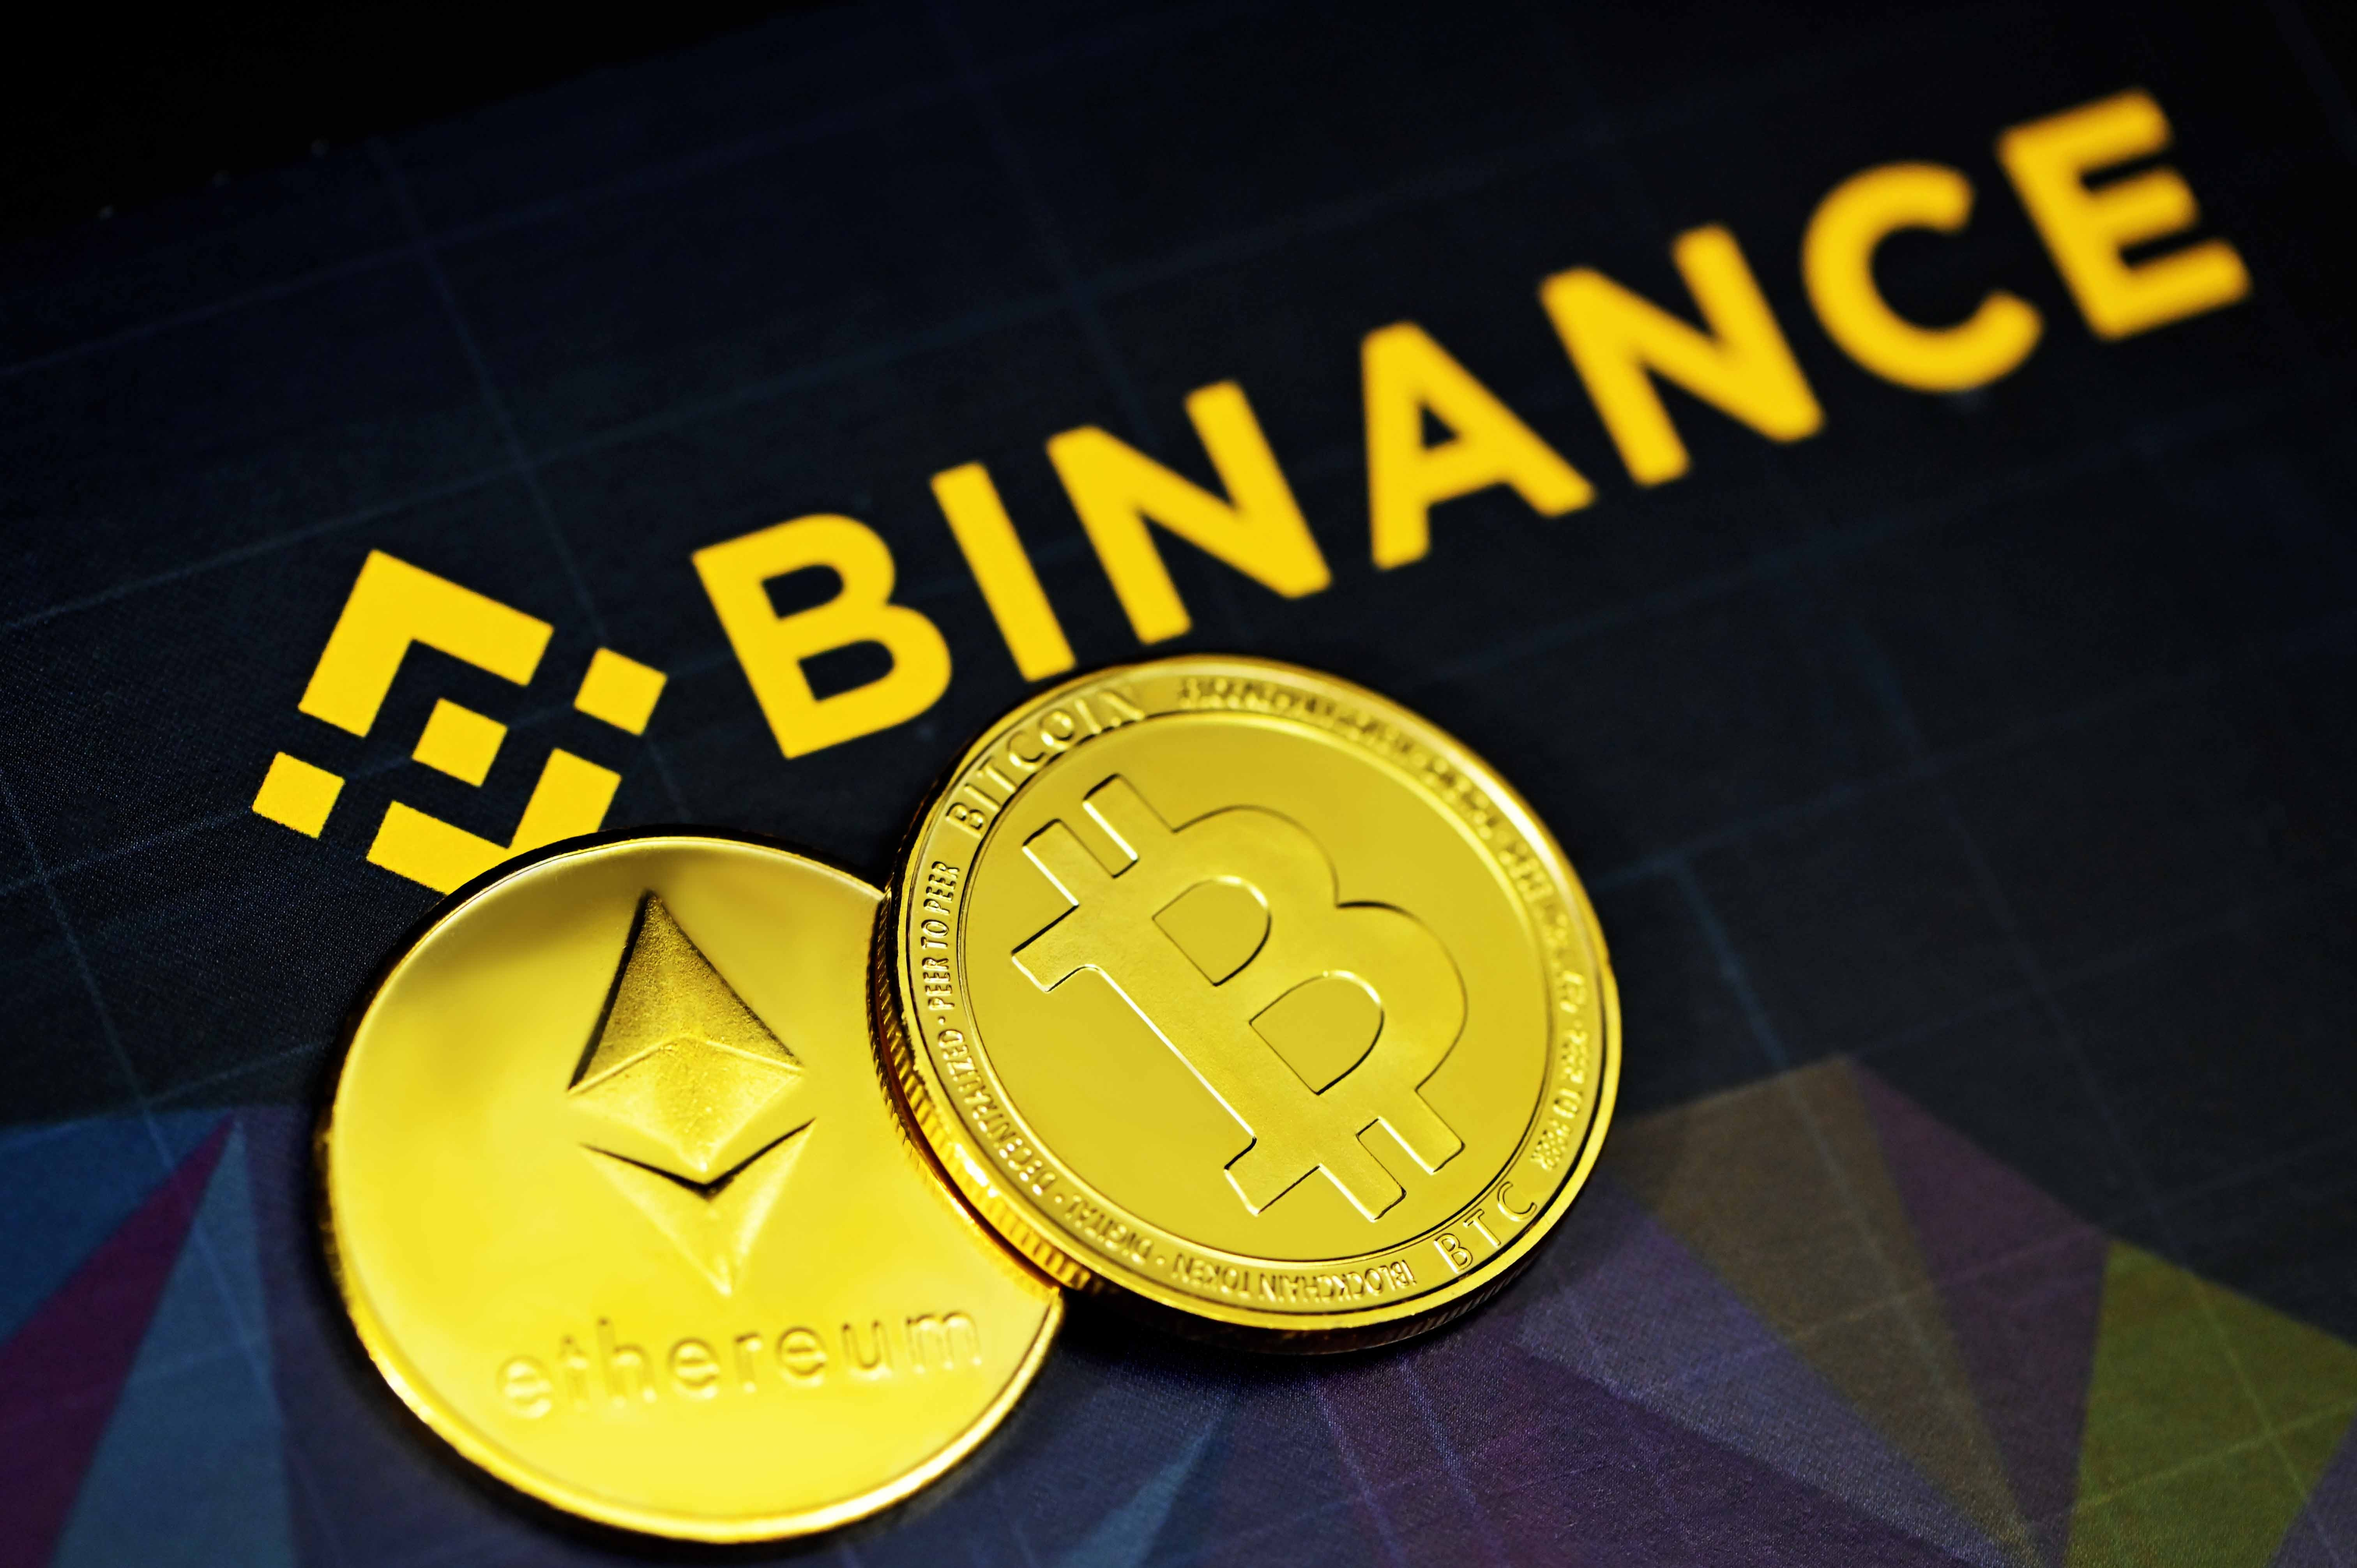 Binance Clamps Down on Customer Verification As Regulatory Pressures Mount